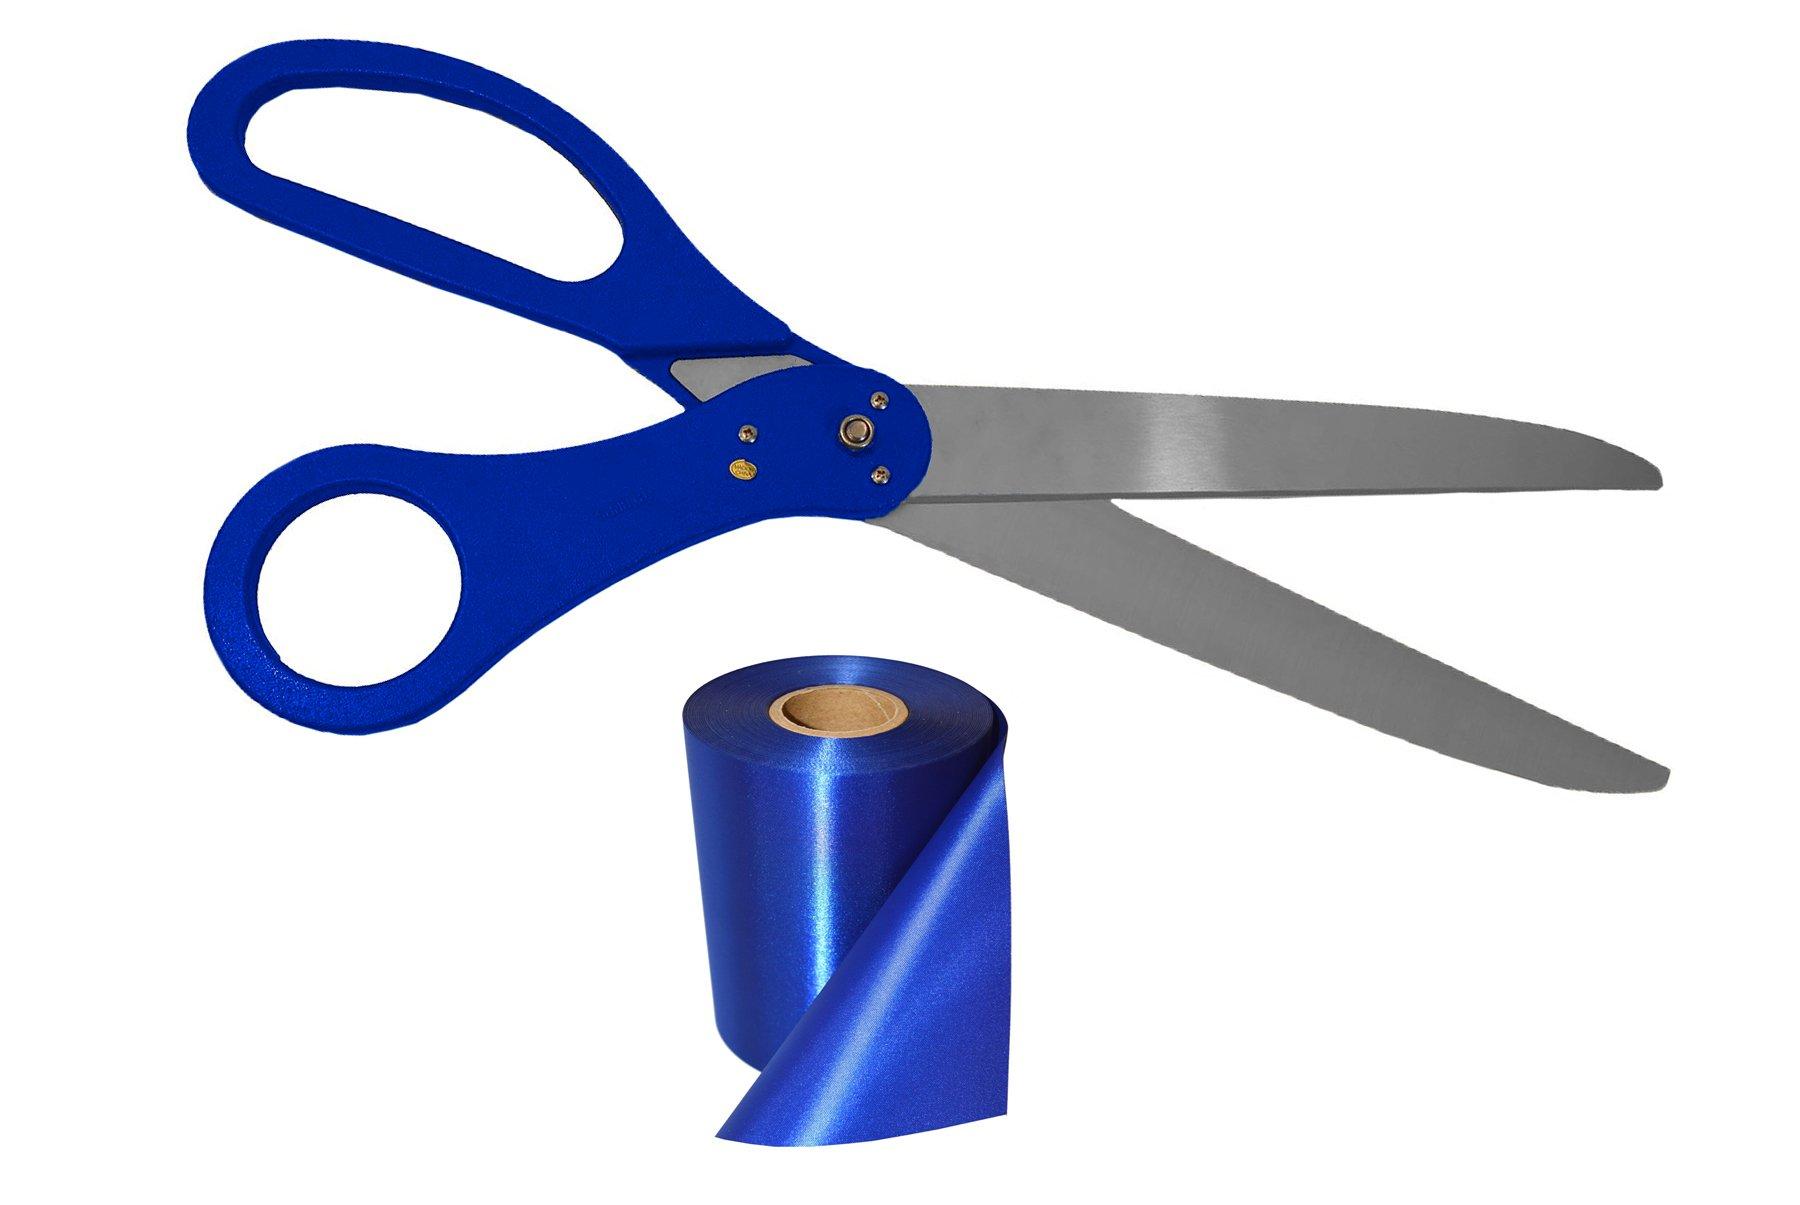 25 Inch Long Blue Handle Ribbon Cutting Scissors & Blue Ribbon 25 Yard Long X 4 Inch Wide by Wonder Costumes